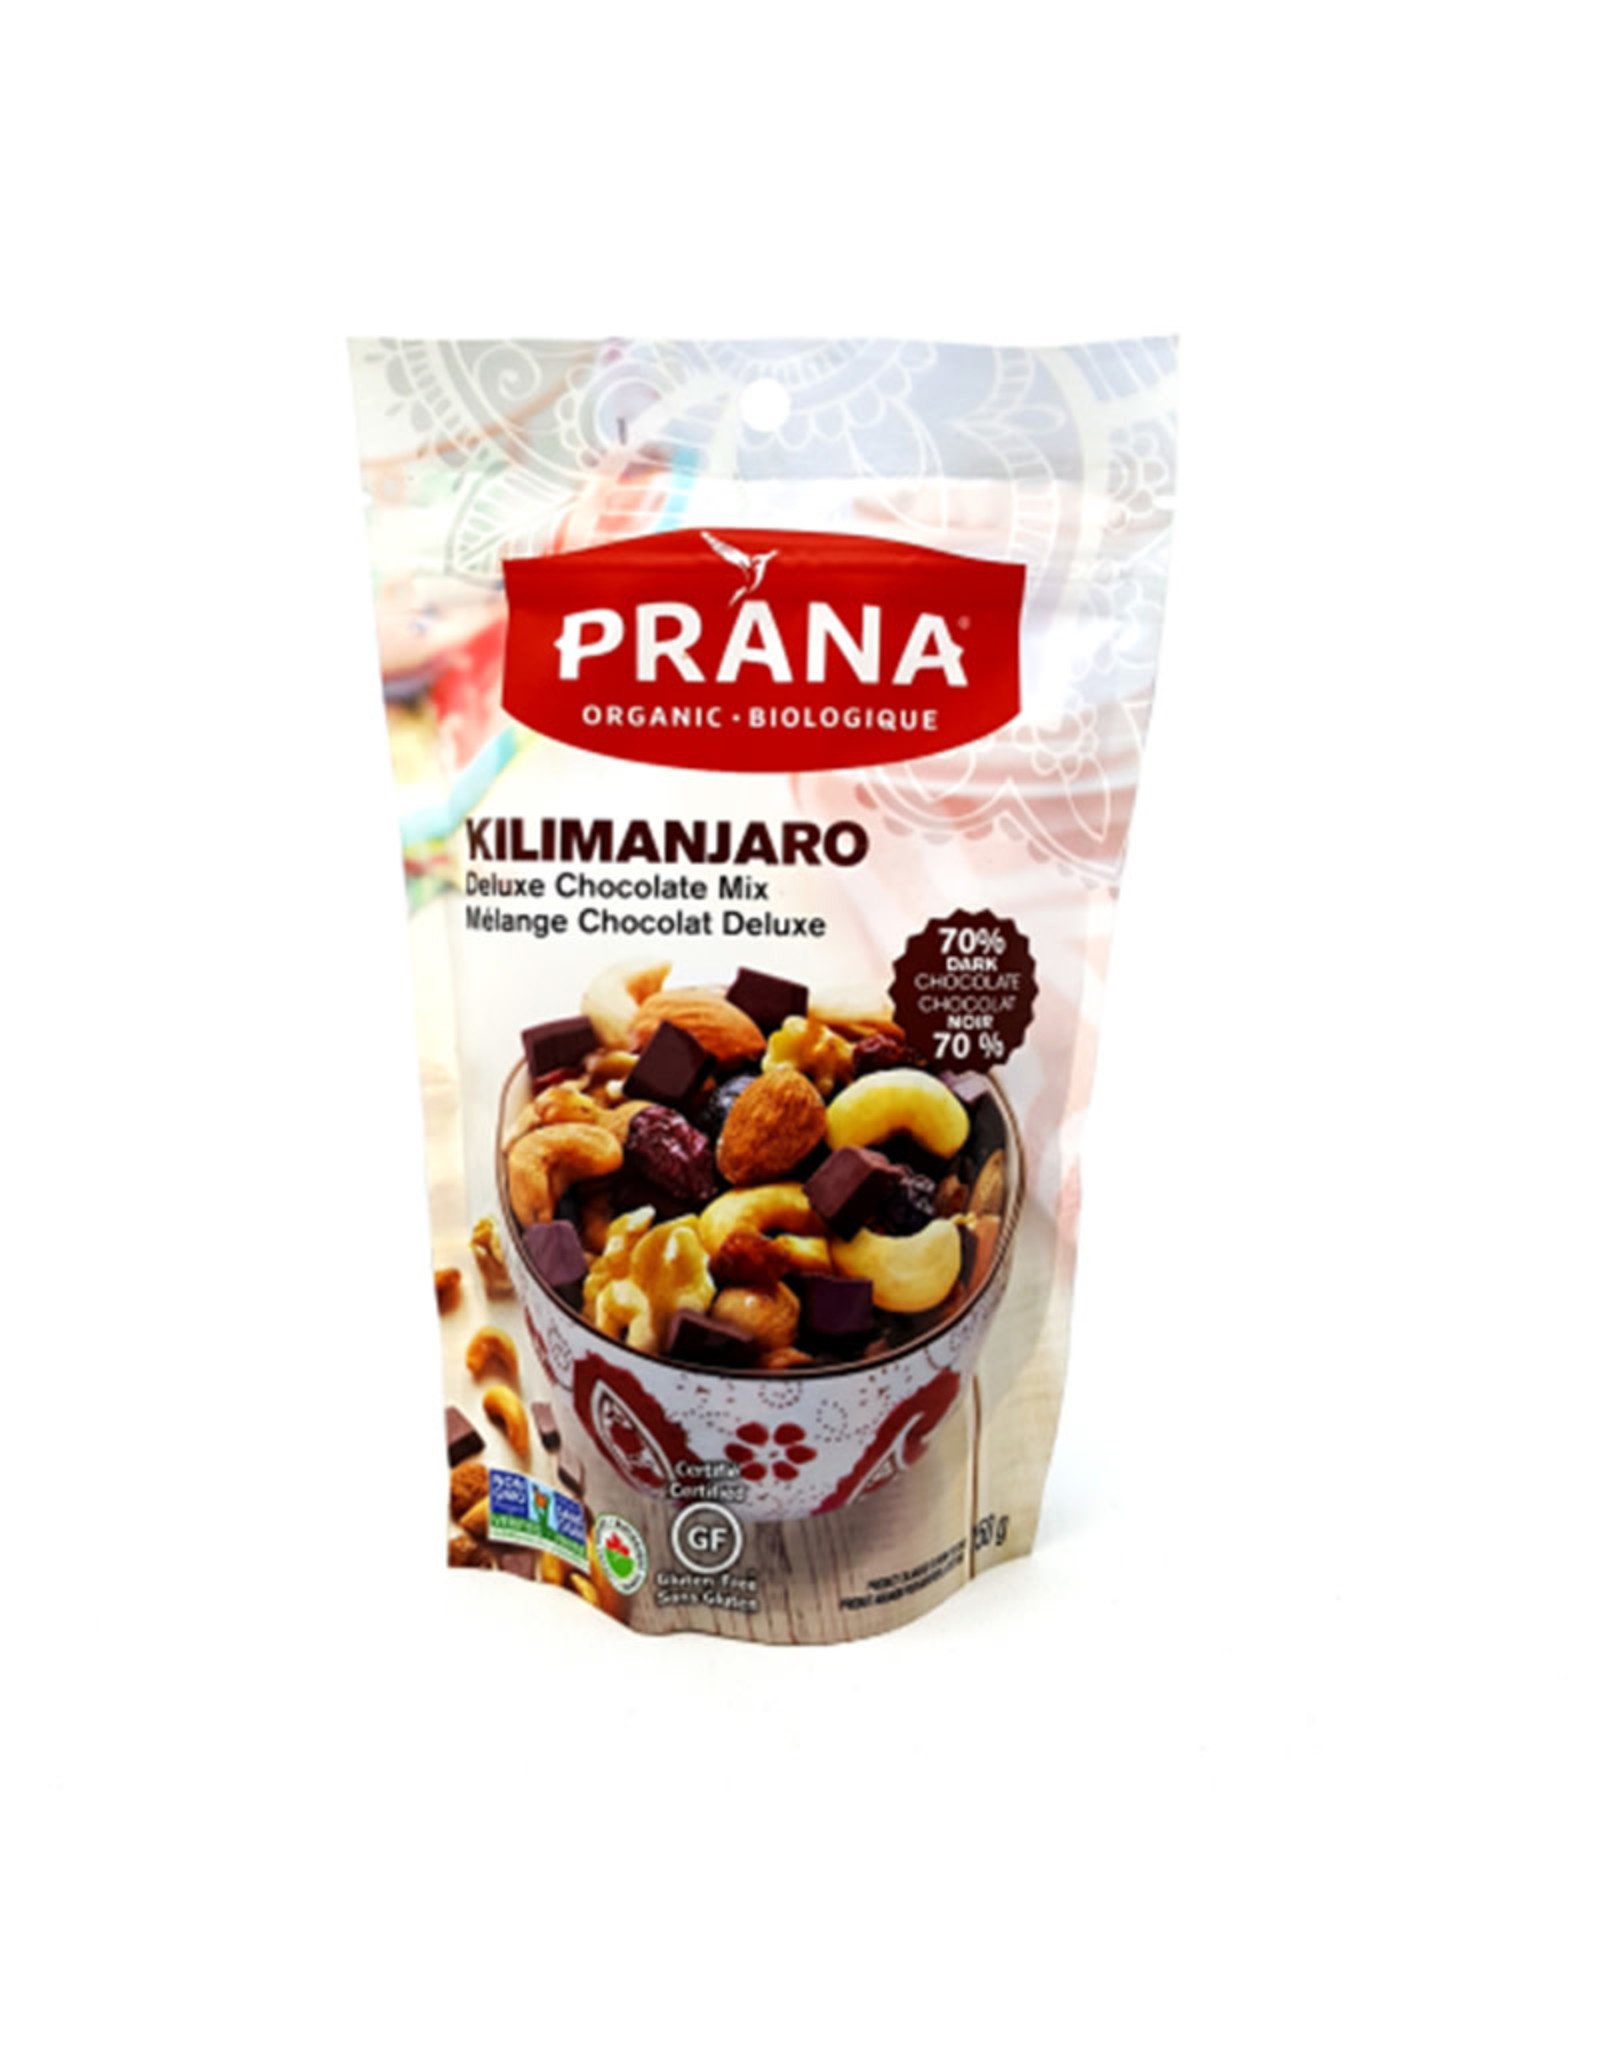 Prana Prana - Mélange Montagnard, Chocolaté Deluxe Kilimanjaro Bio (150g)